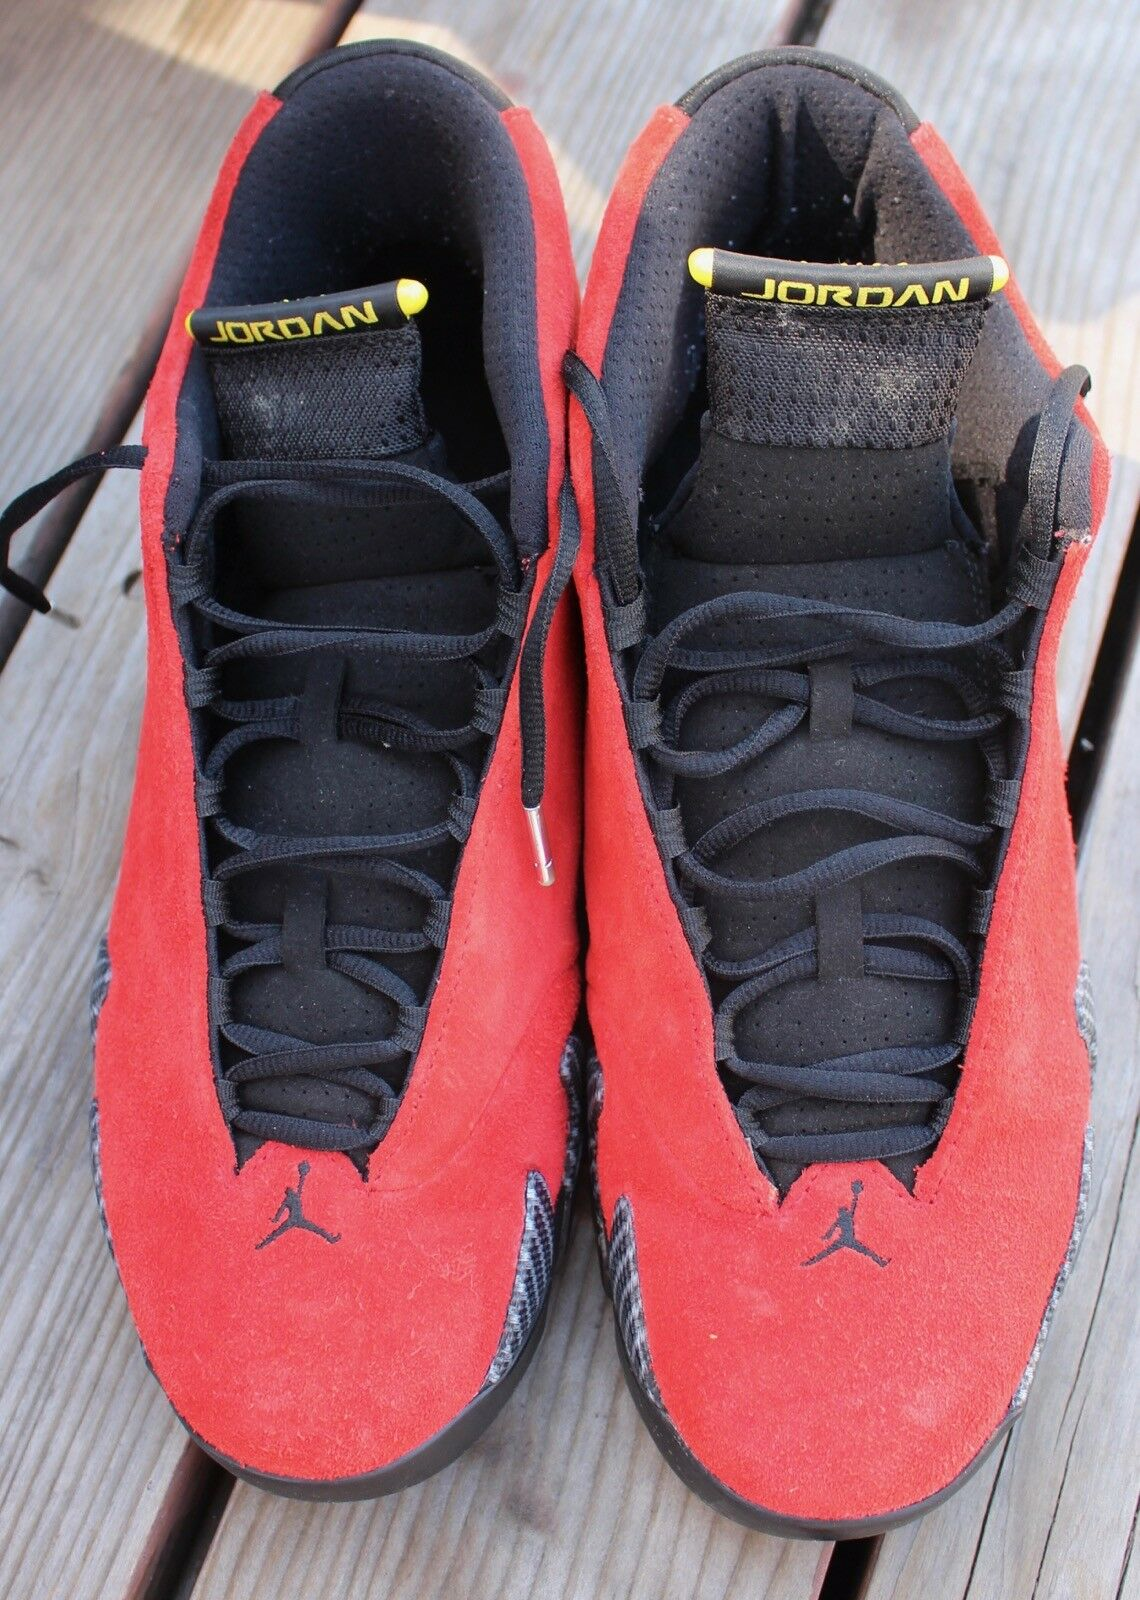 Nike air jordan xiv 14 retrò ferrari 654459-670 dimensioni dimensioni dimensioni 13  w / scatola  giallo rosso nero cc94c2